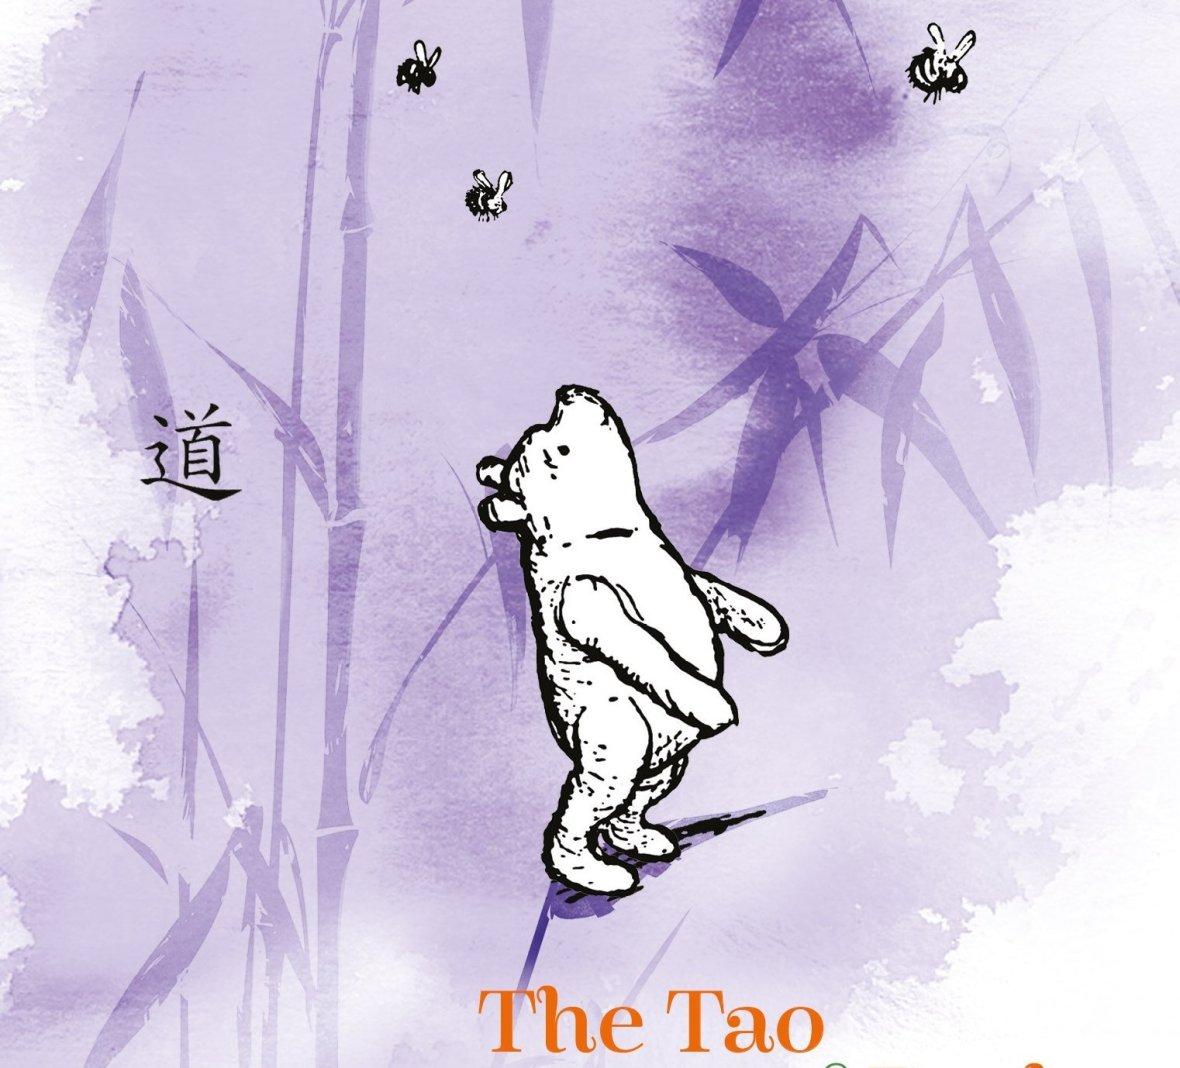 the tao r/r